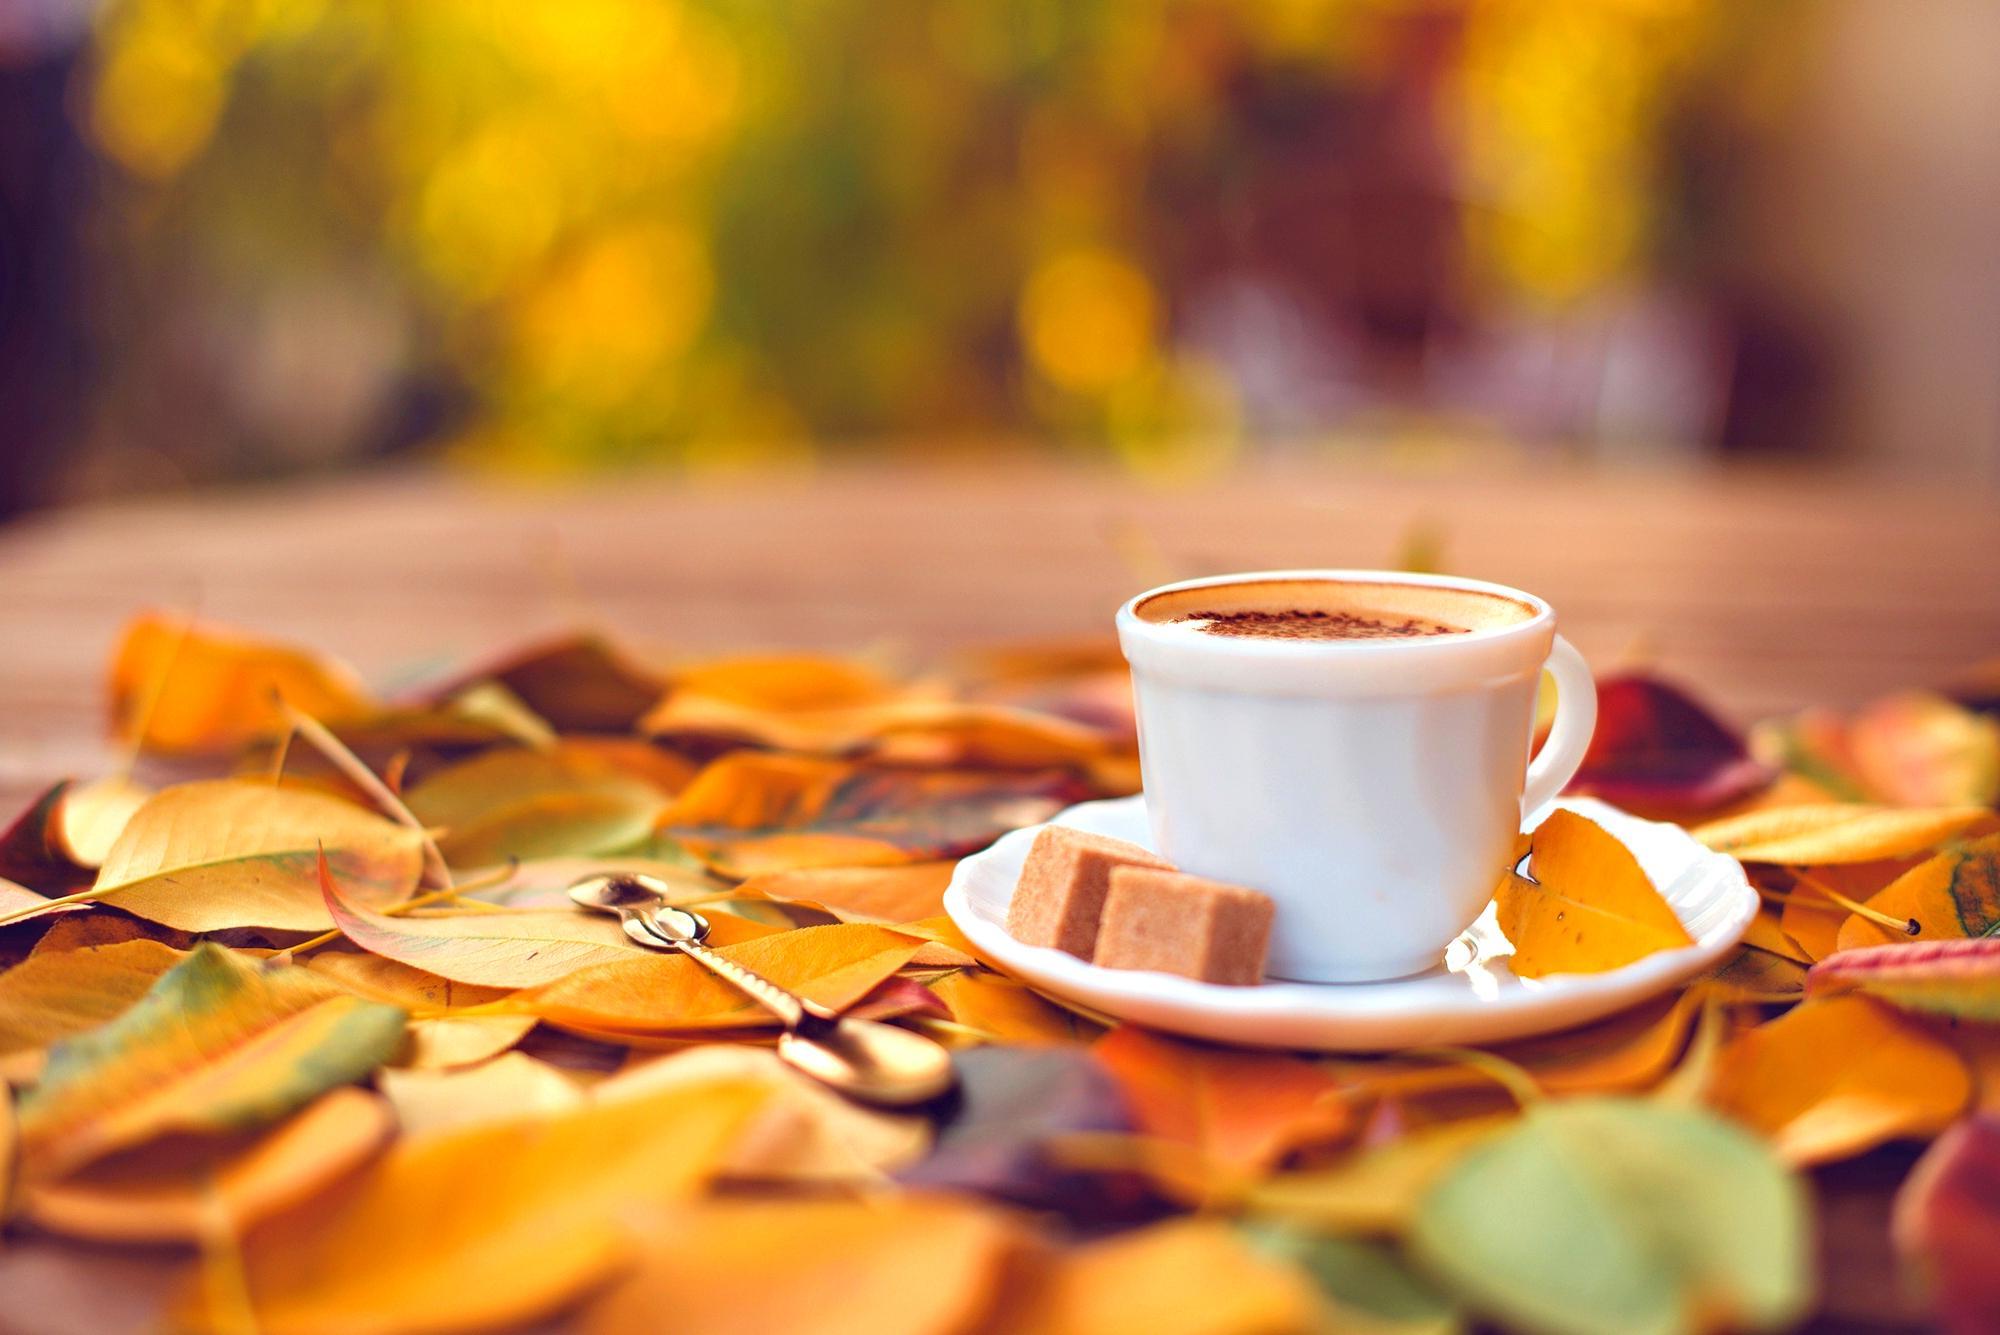 Sweet Coffee And An Autumn Carpet HD Wallpaper